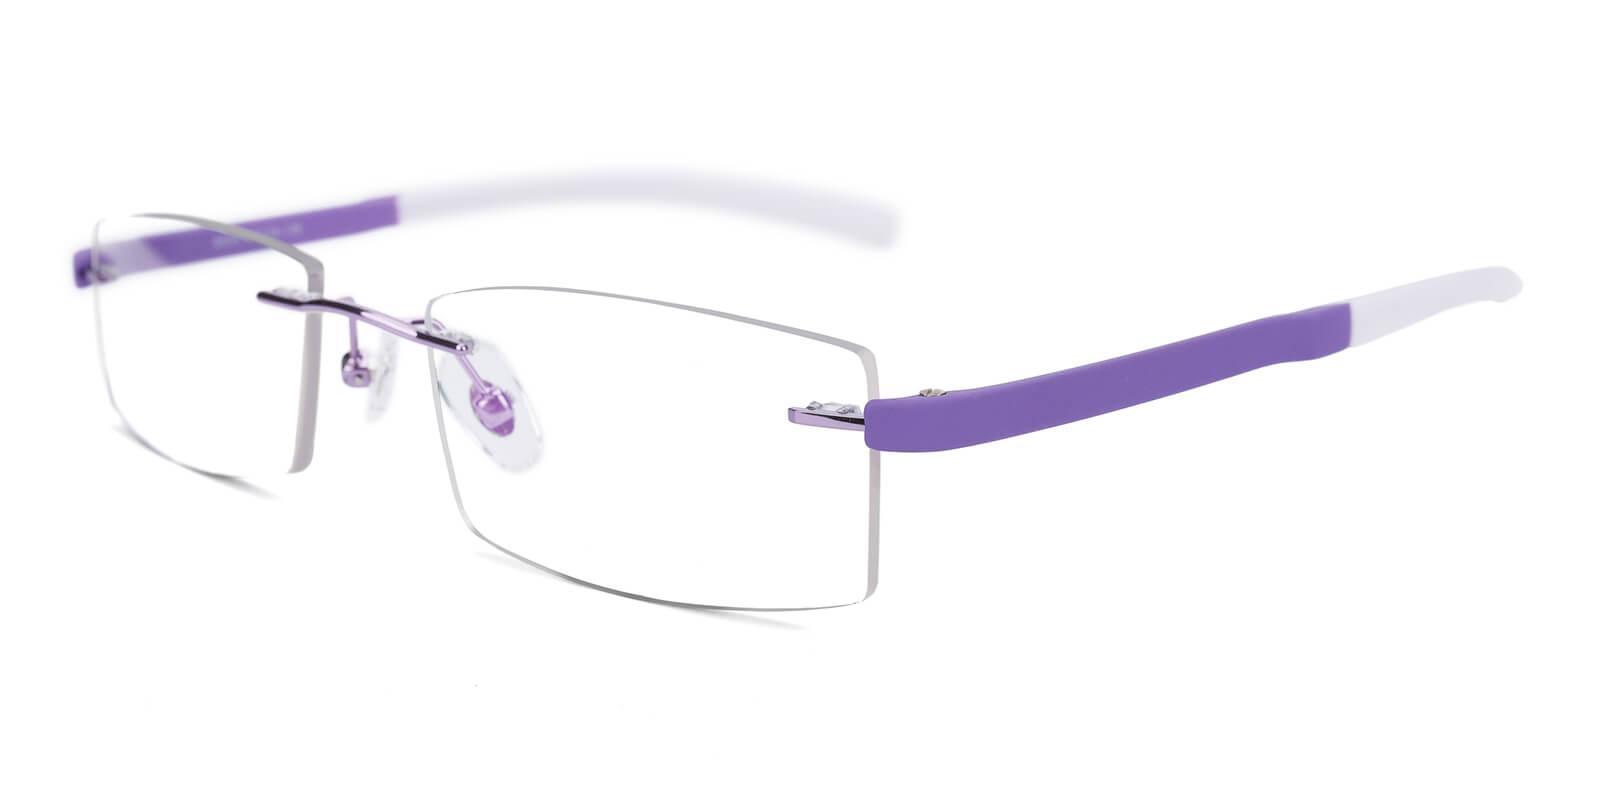 Trimming-Purple-Varieties-Metal / Acetate-Eyeglasses-additional1